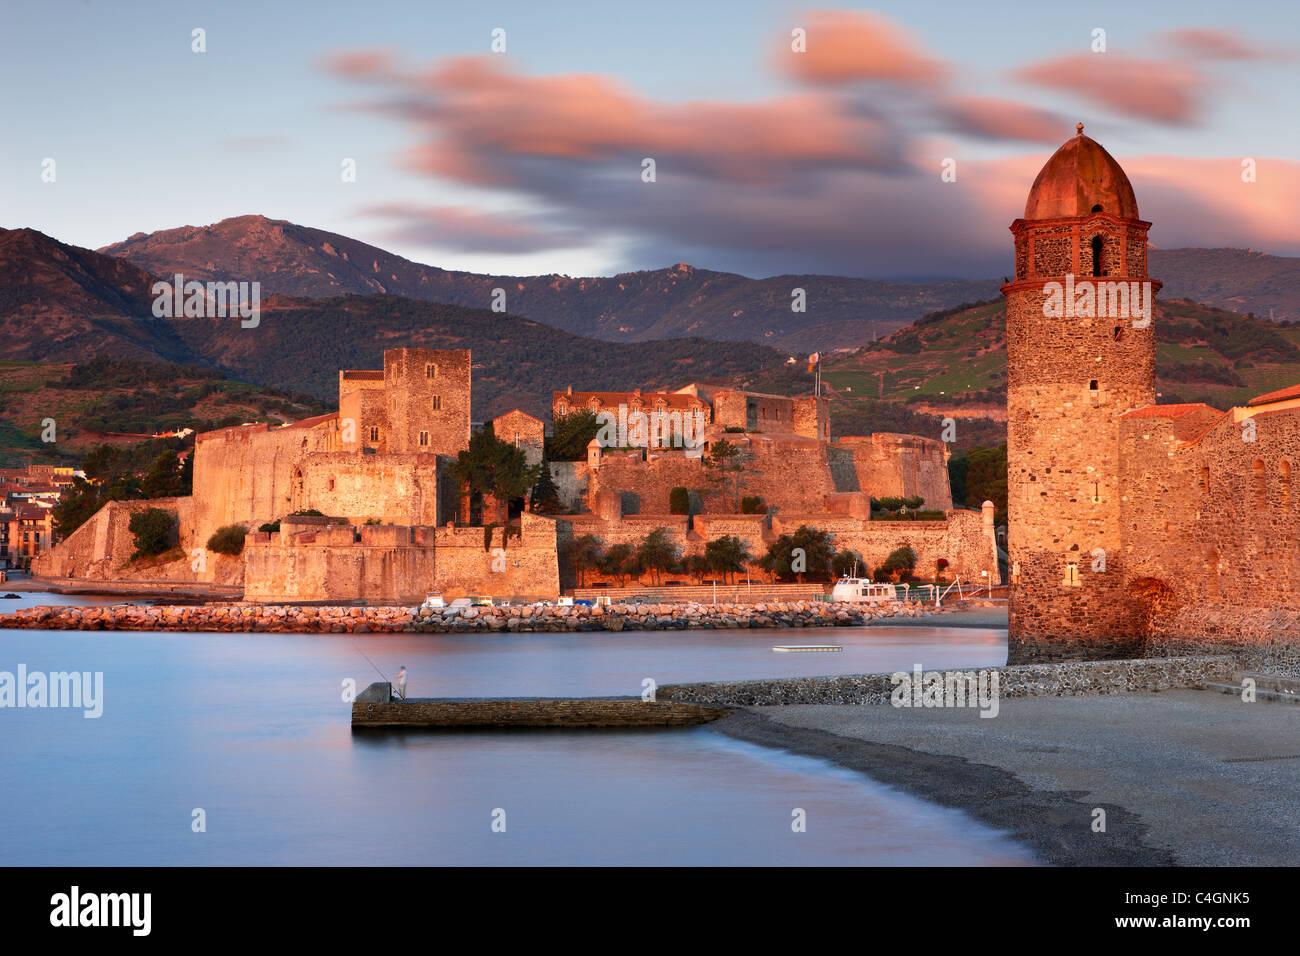 Collioure at dawn, Cote Vermeille, Pyranees-Orientales, Languedoc-Rousillon, France - Stock Image